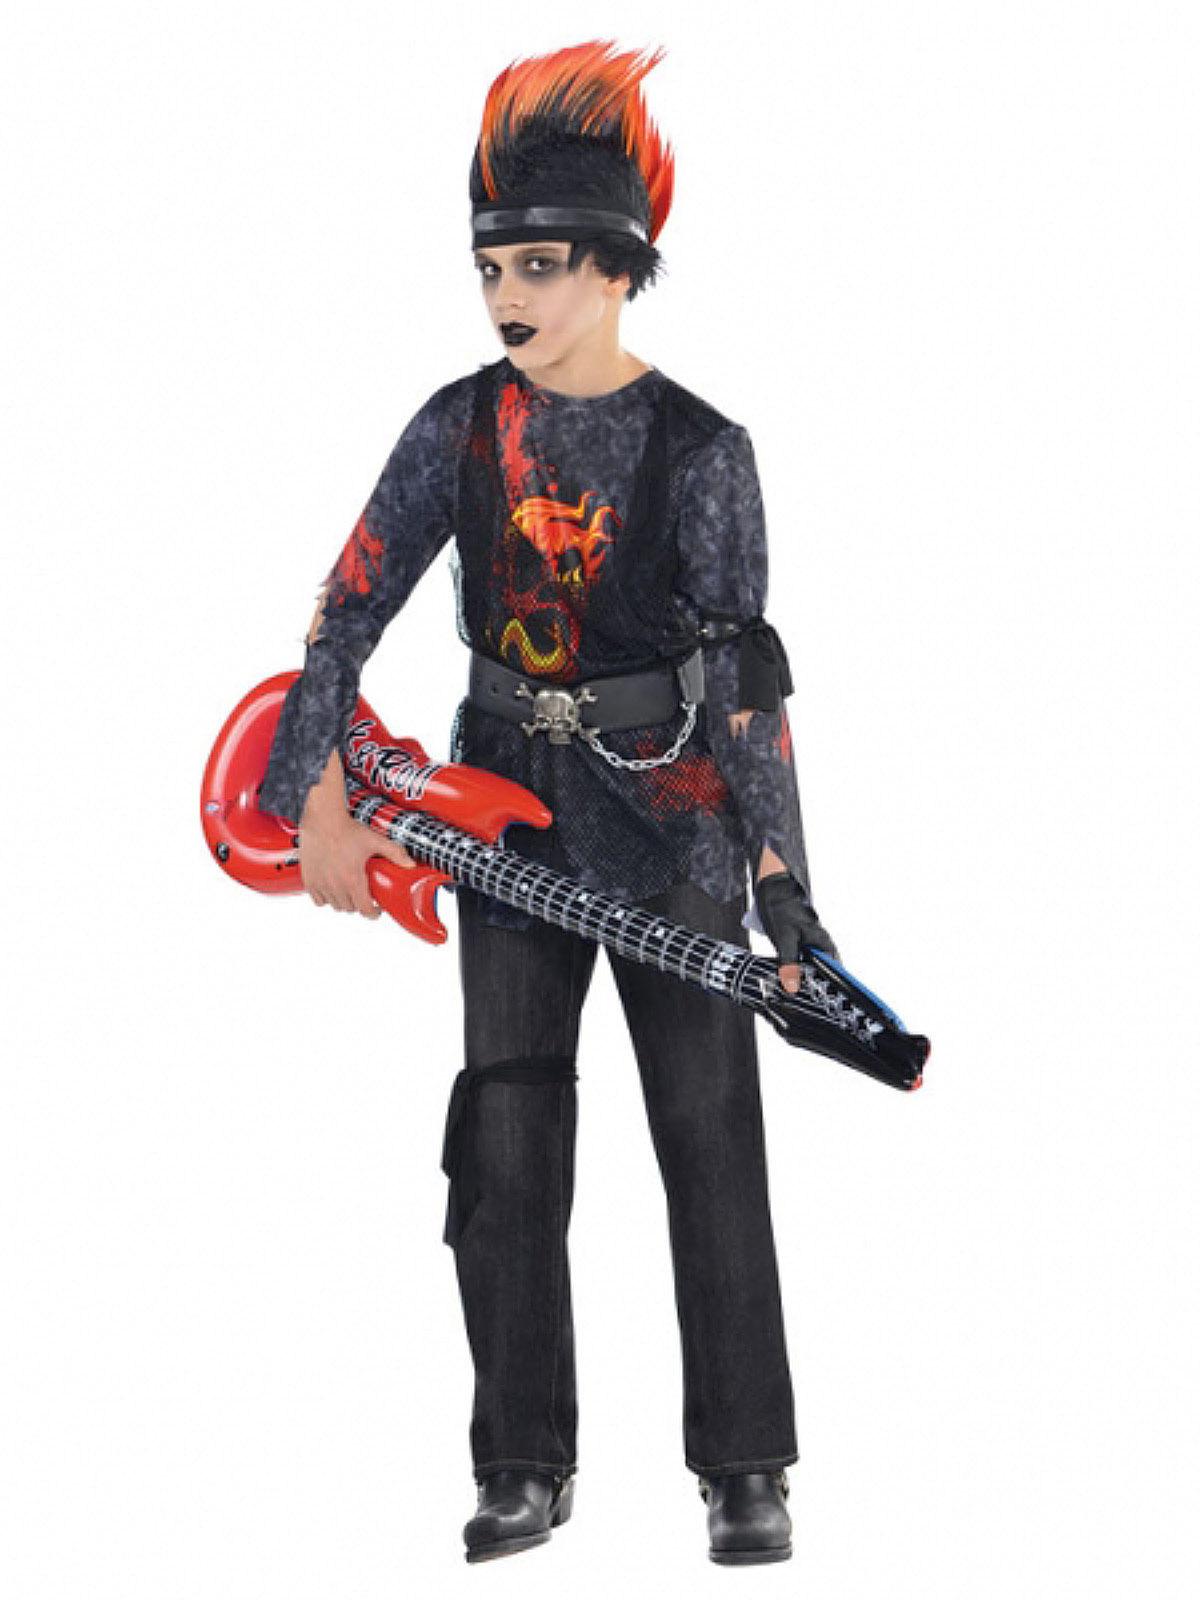 Rockstar Kinderkostum Haloween Bunt Gunstige Halloween Kostume Bei